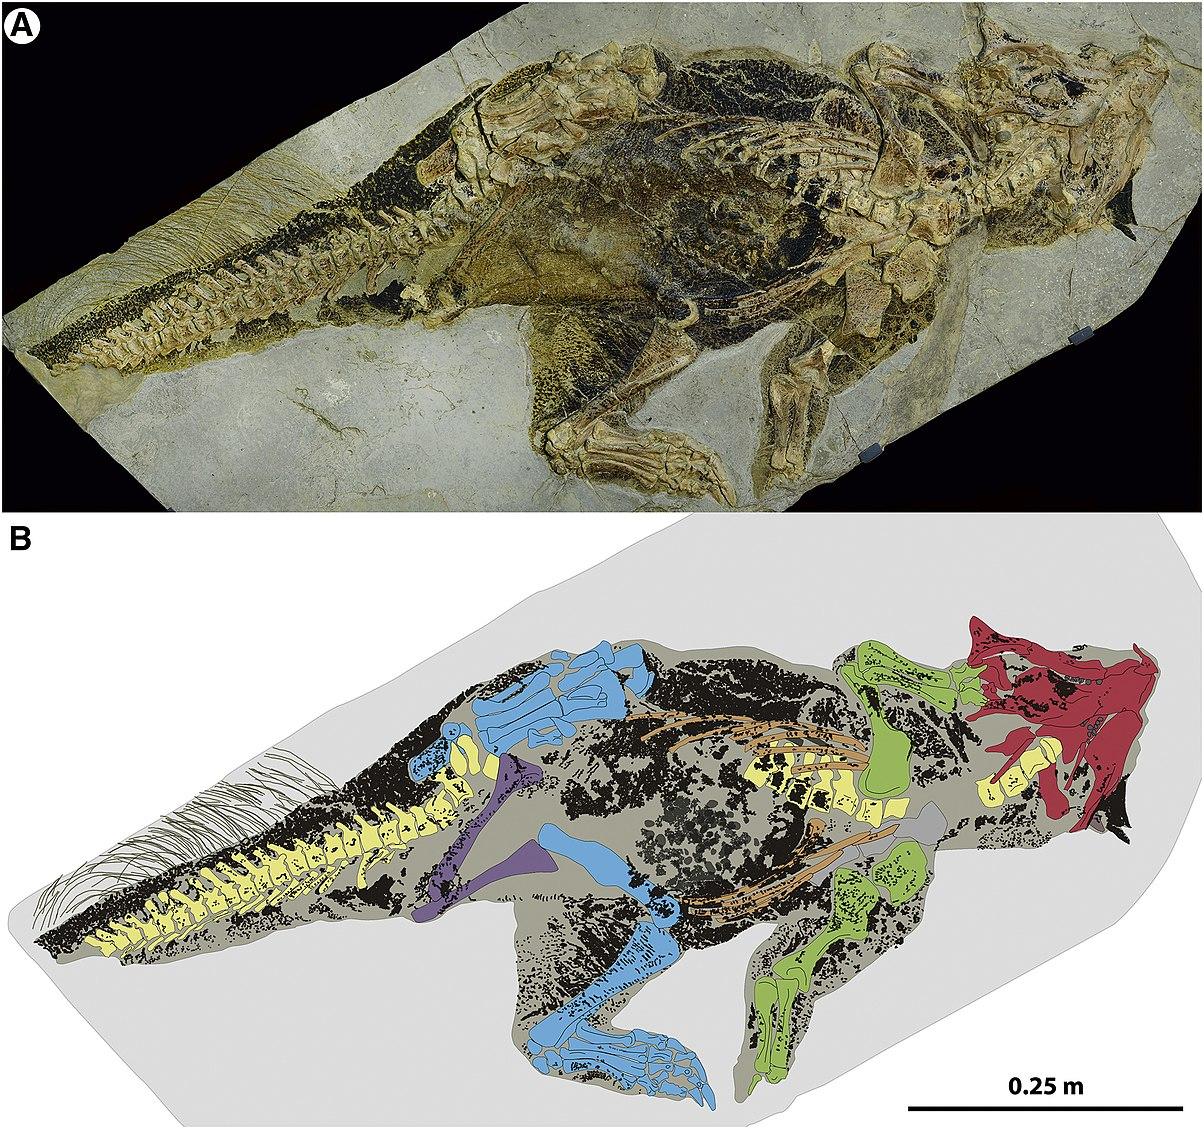 [Image: 1204px-Psittacosaurus_SMF_R_4970.jpg]